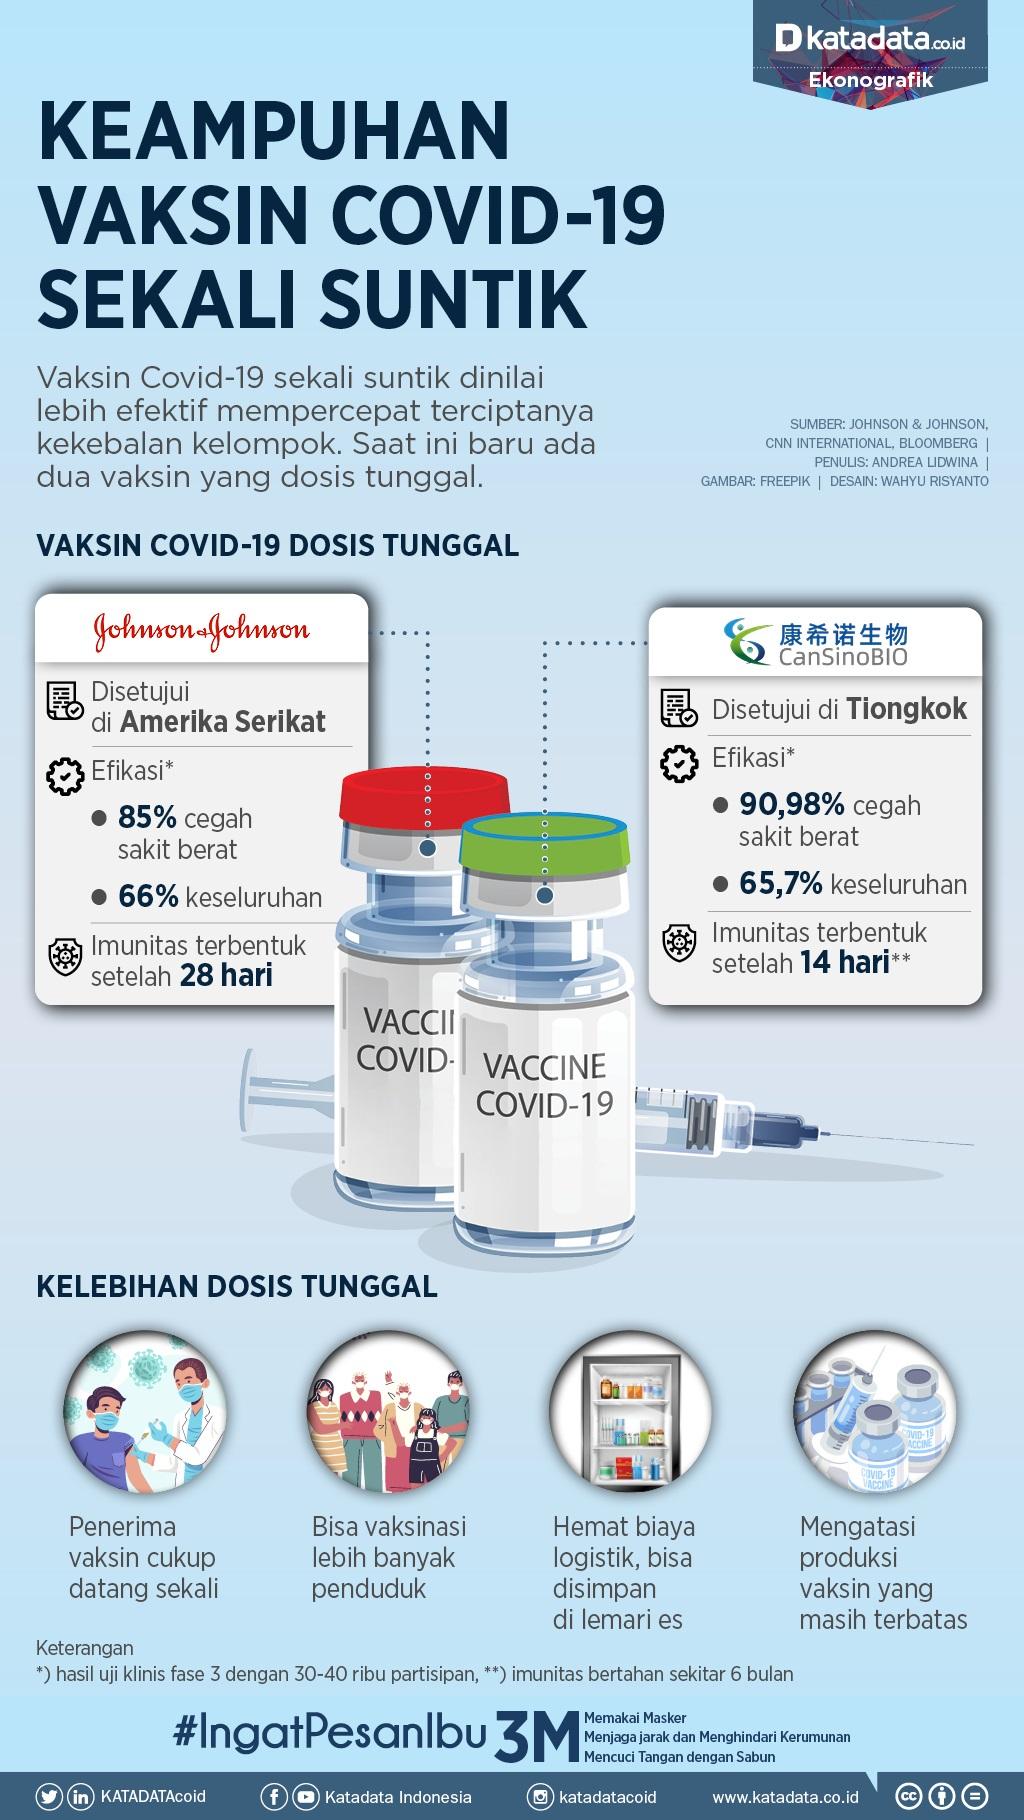 Infografik_Keampuhan vaksin covid-19 sekali suntik